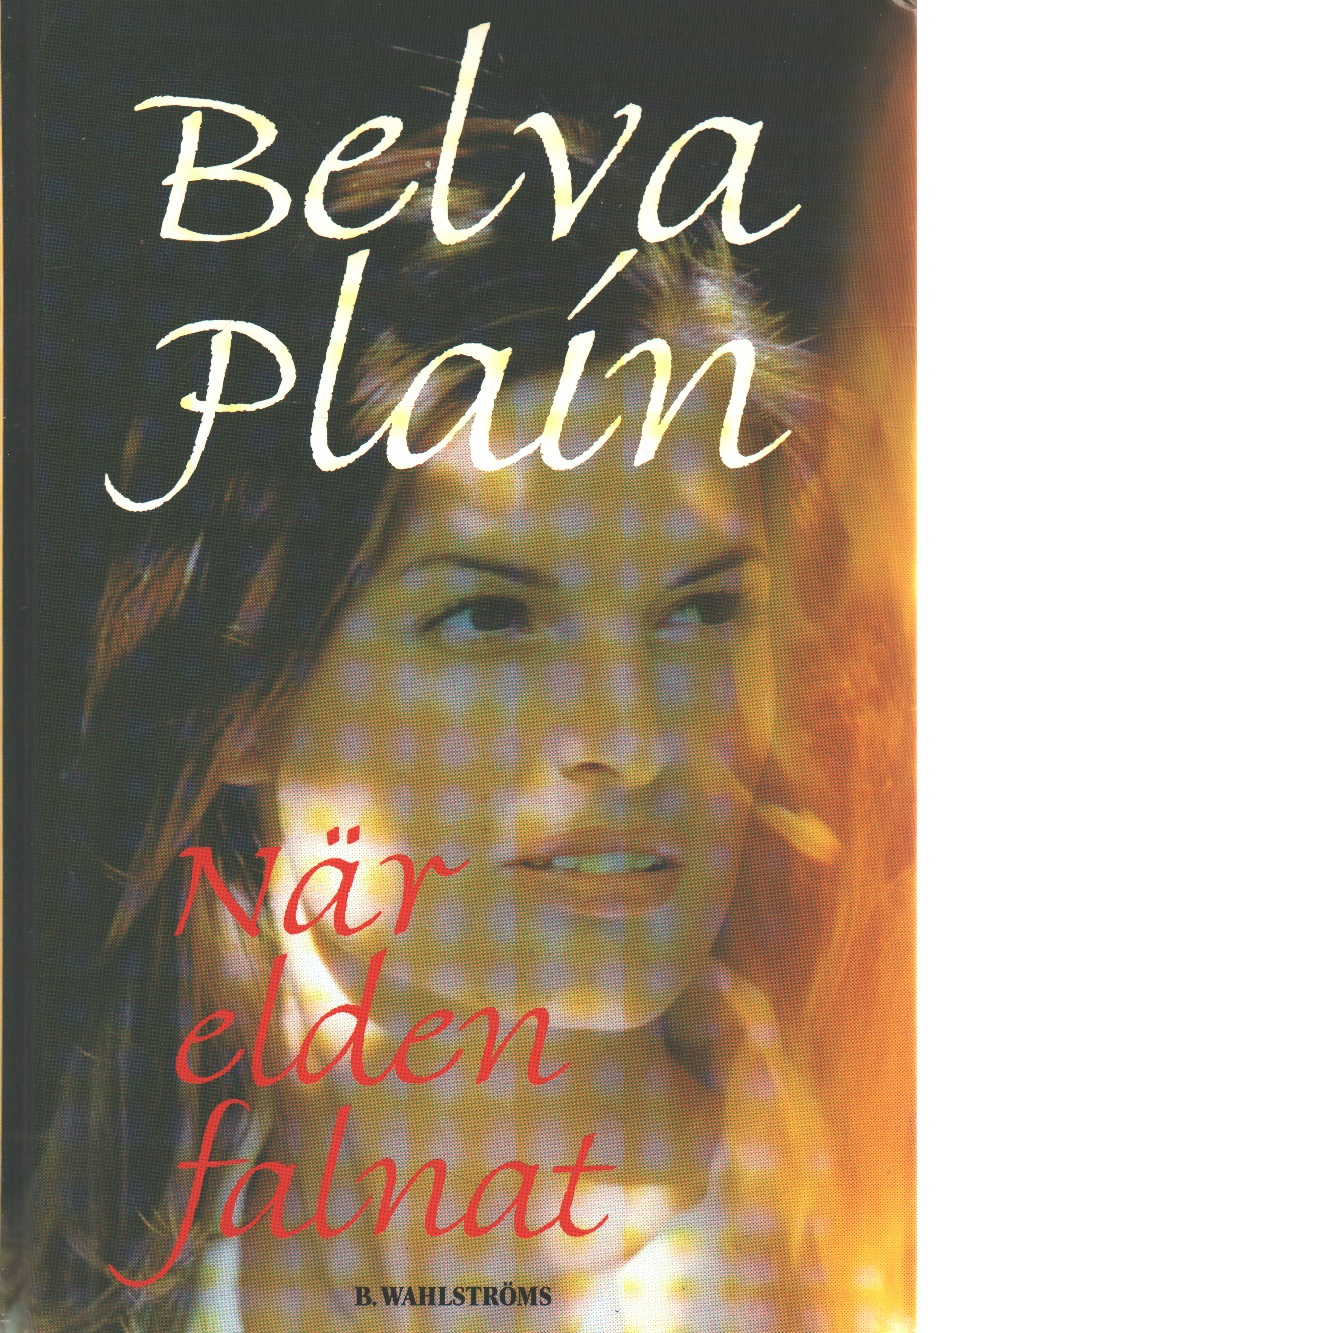 När elden falnat - Plain, Belva